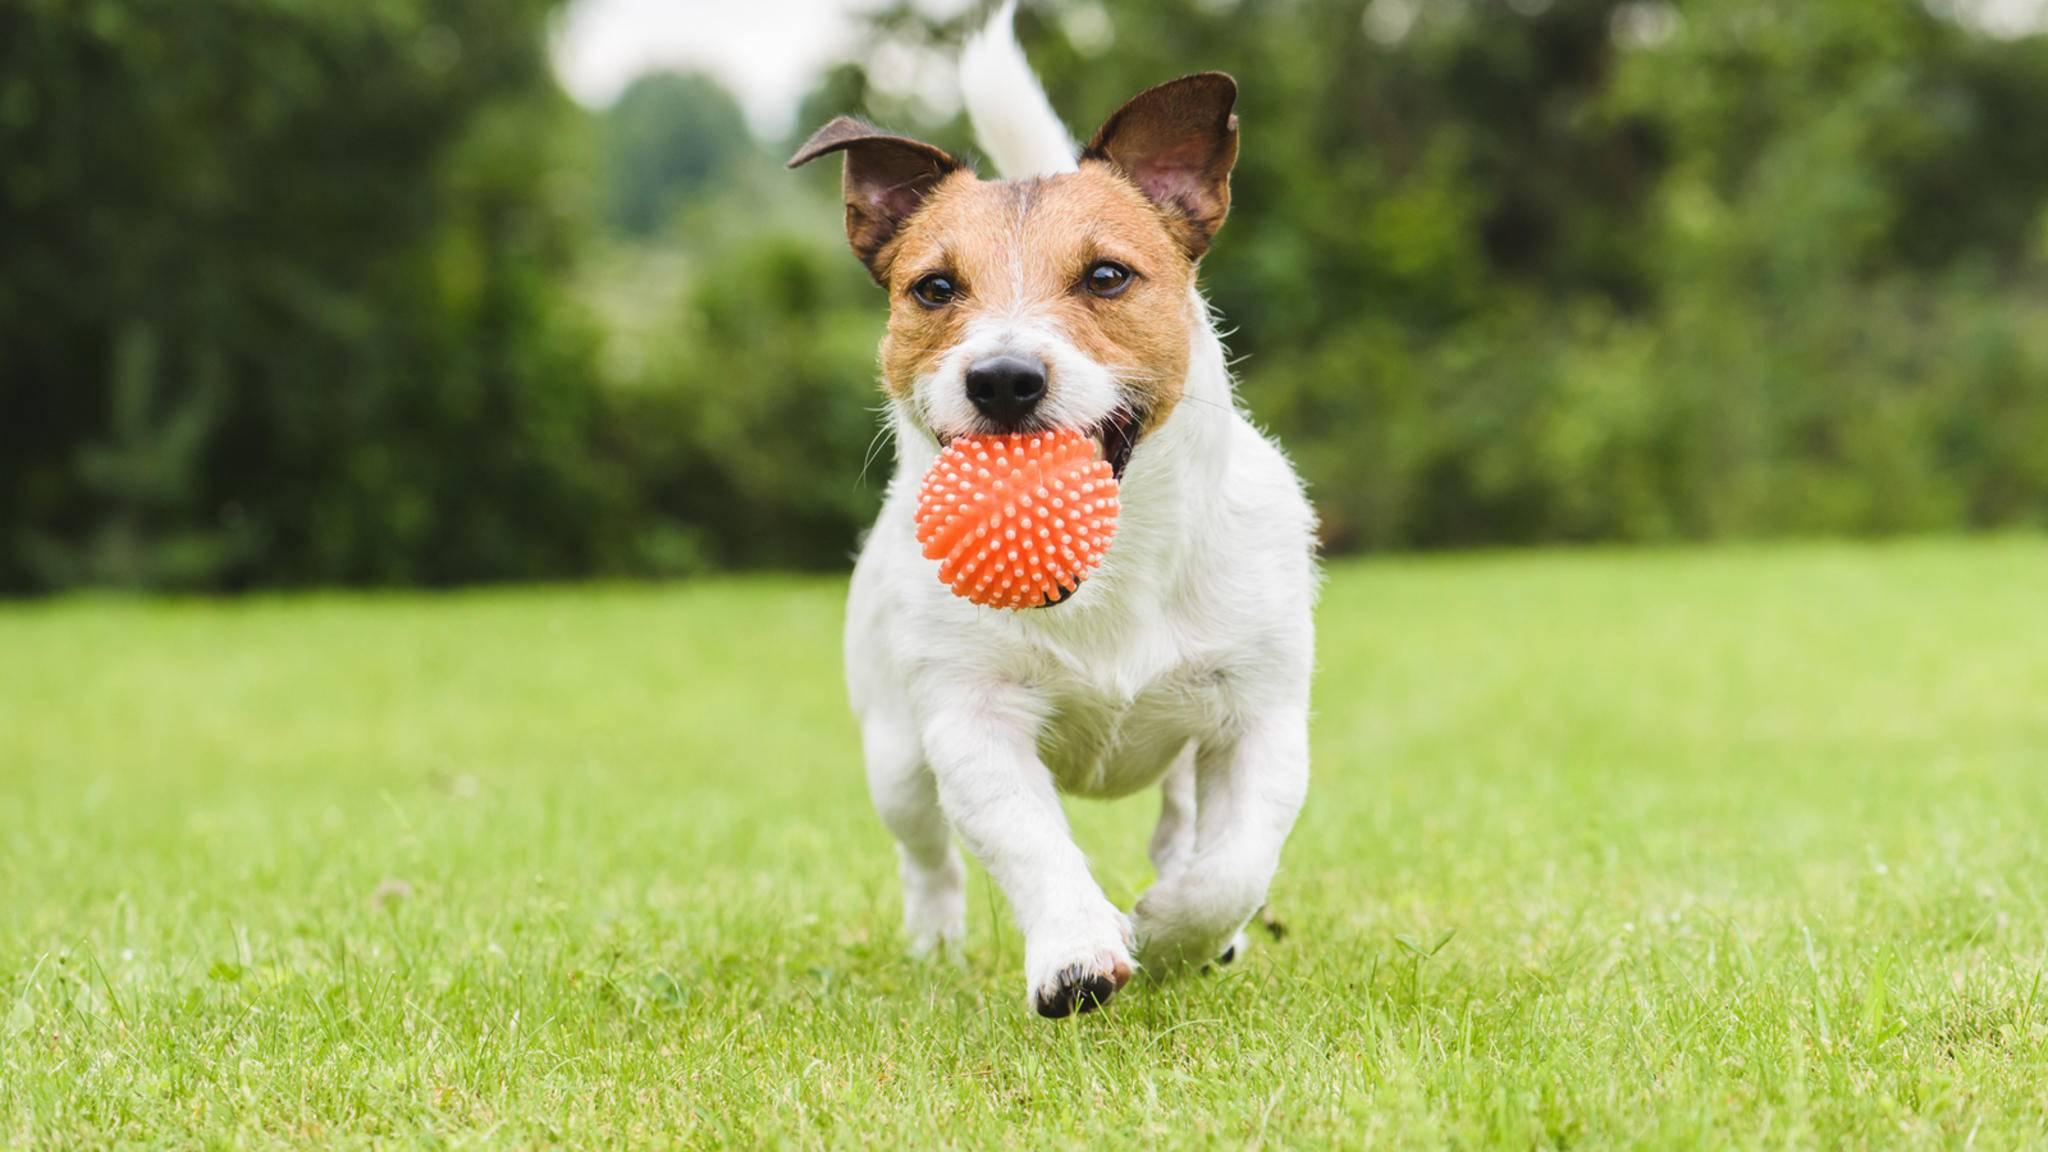 Egal, ob groß oder klein: Mit dem Ball spielt fast jeder Hund gerne.